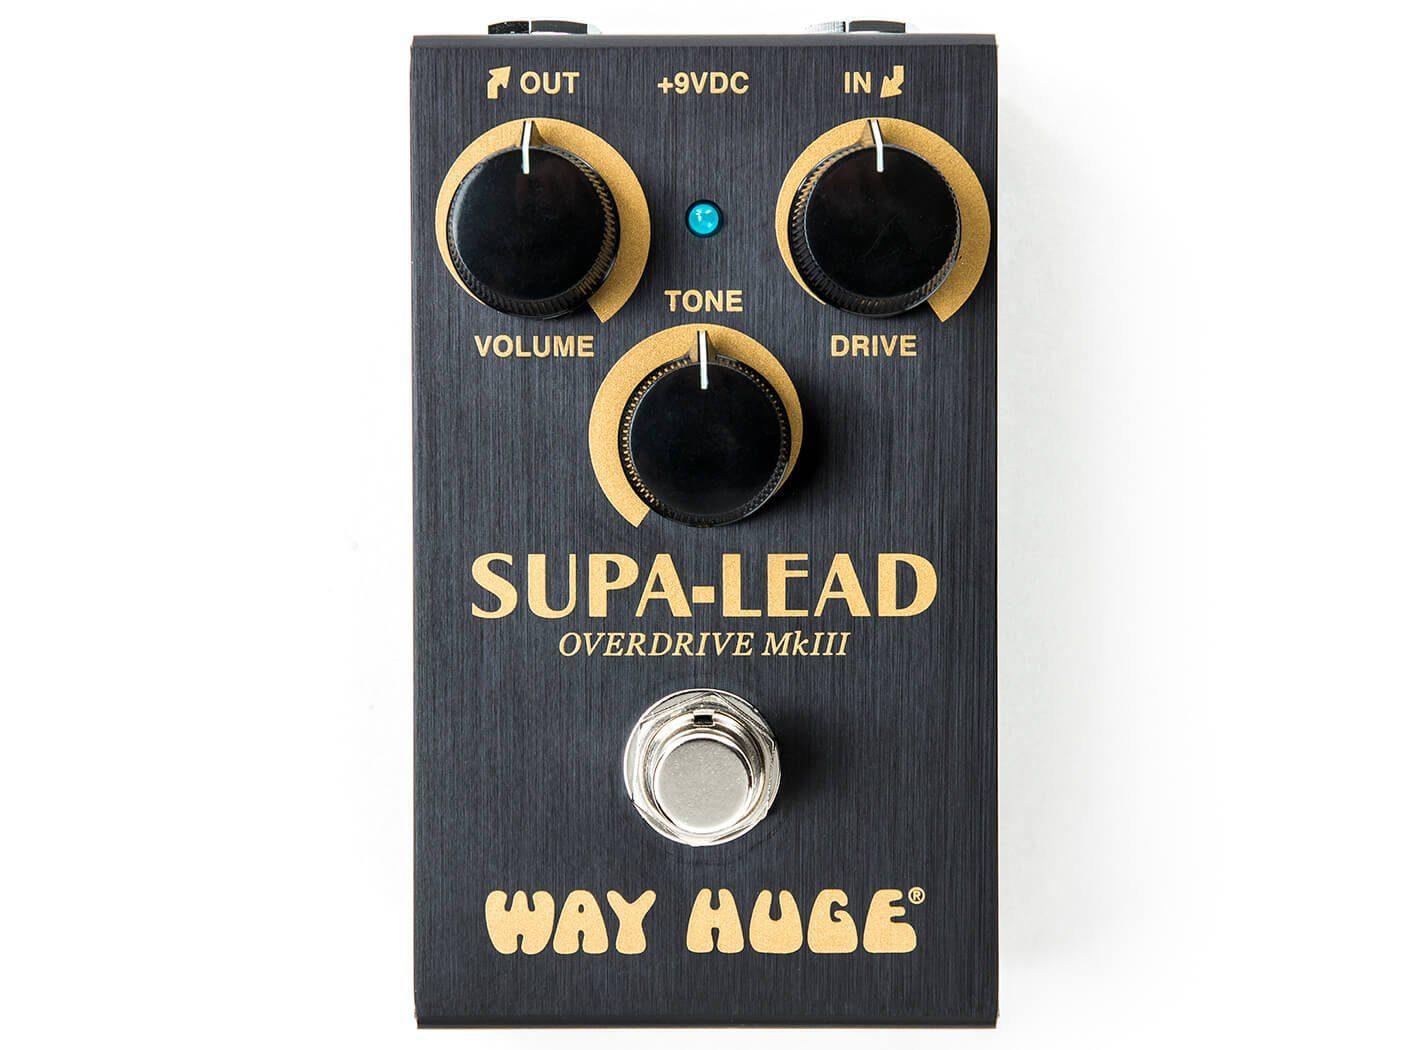 way-huge-smalls-supa-lead-overdrive@1400x1050